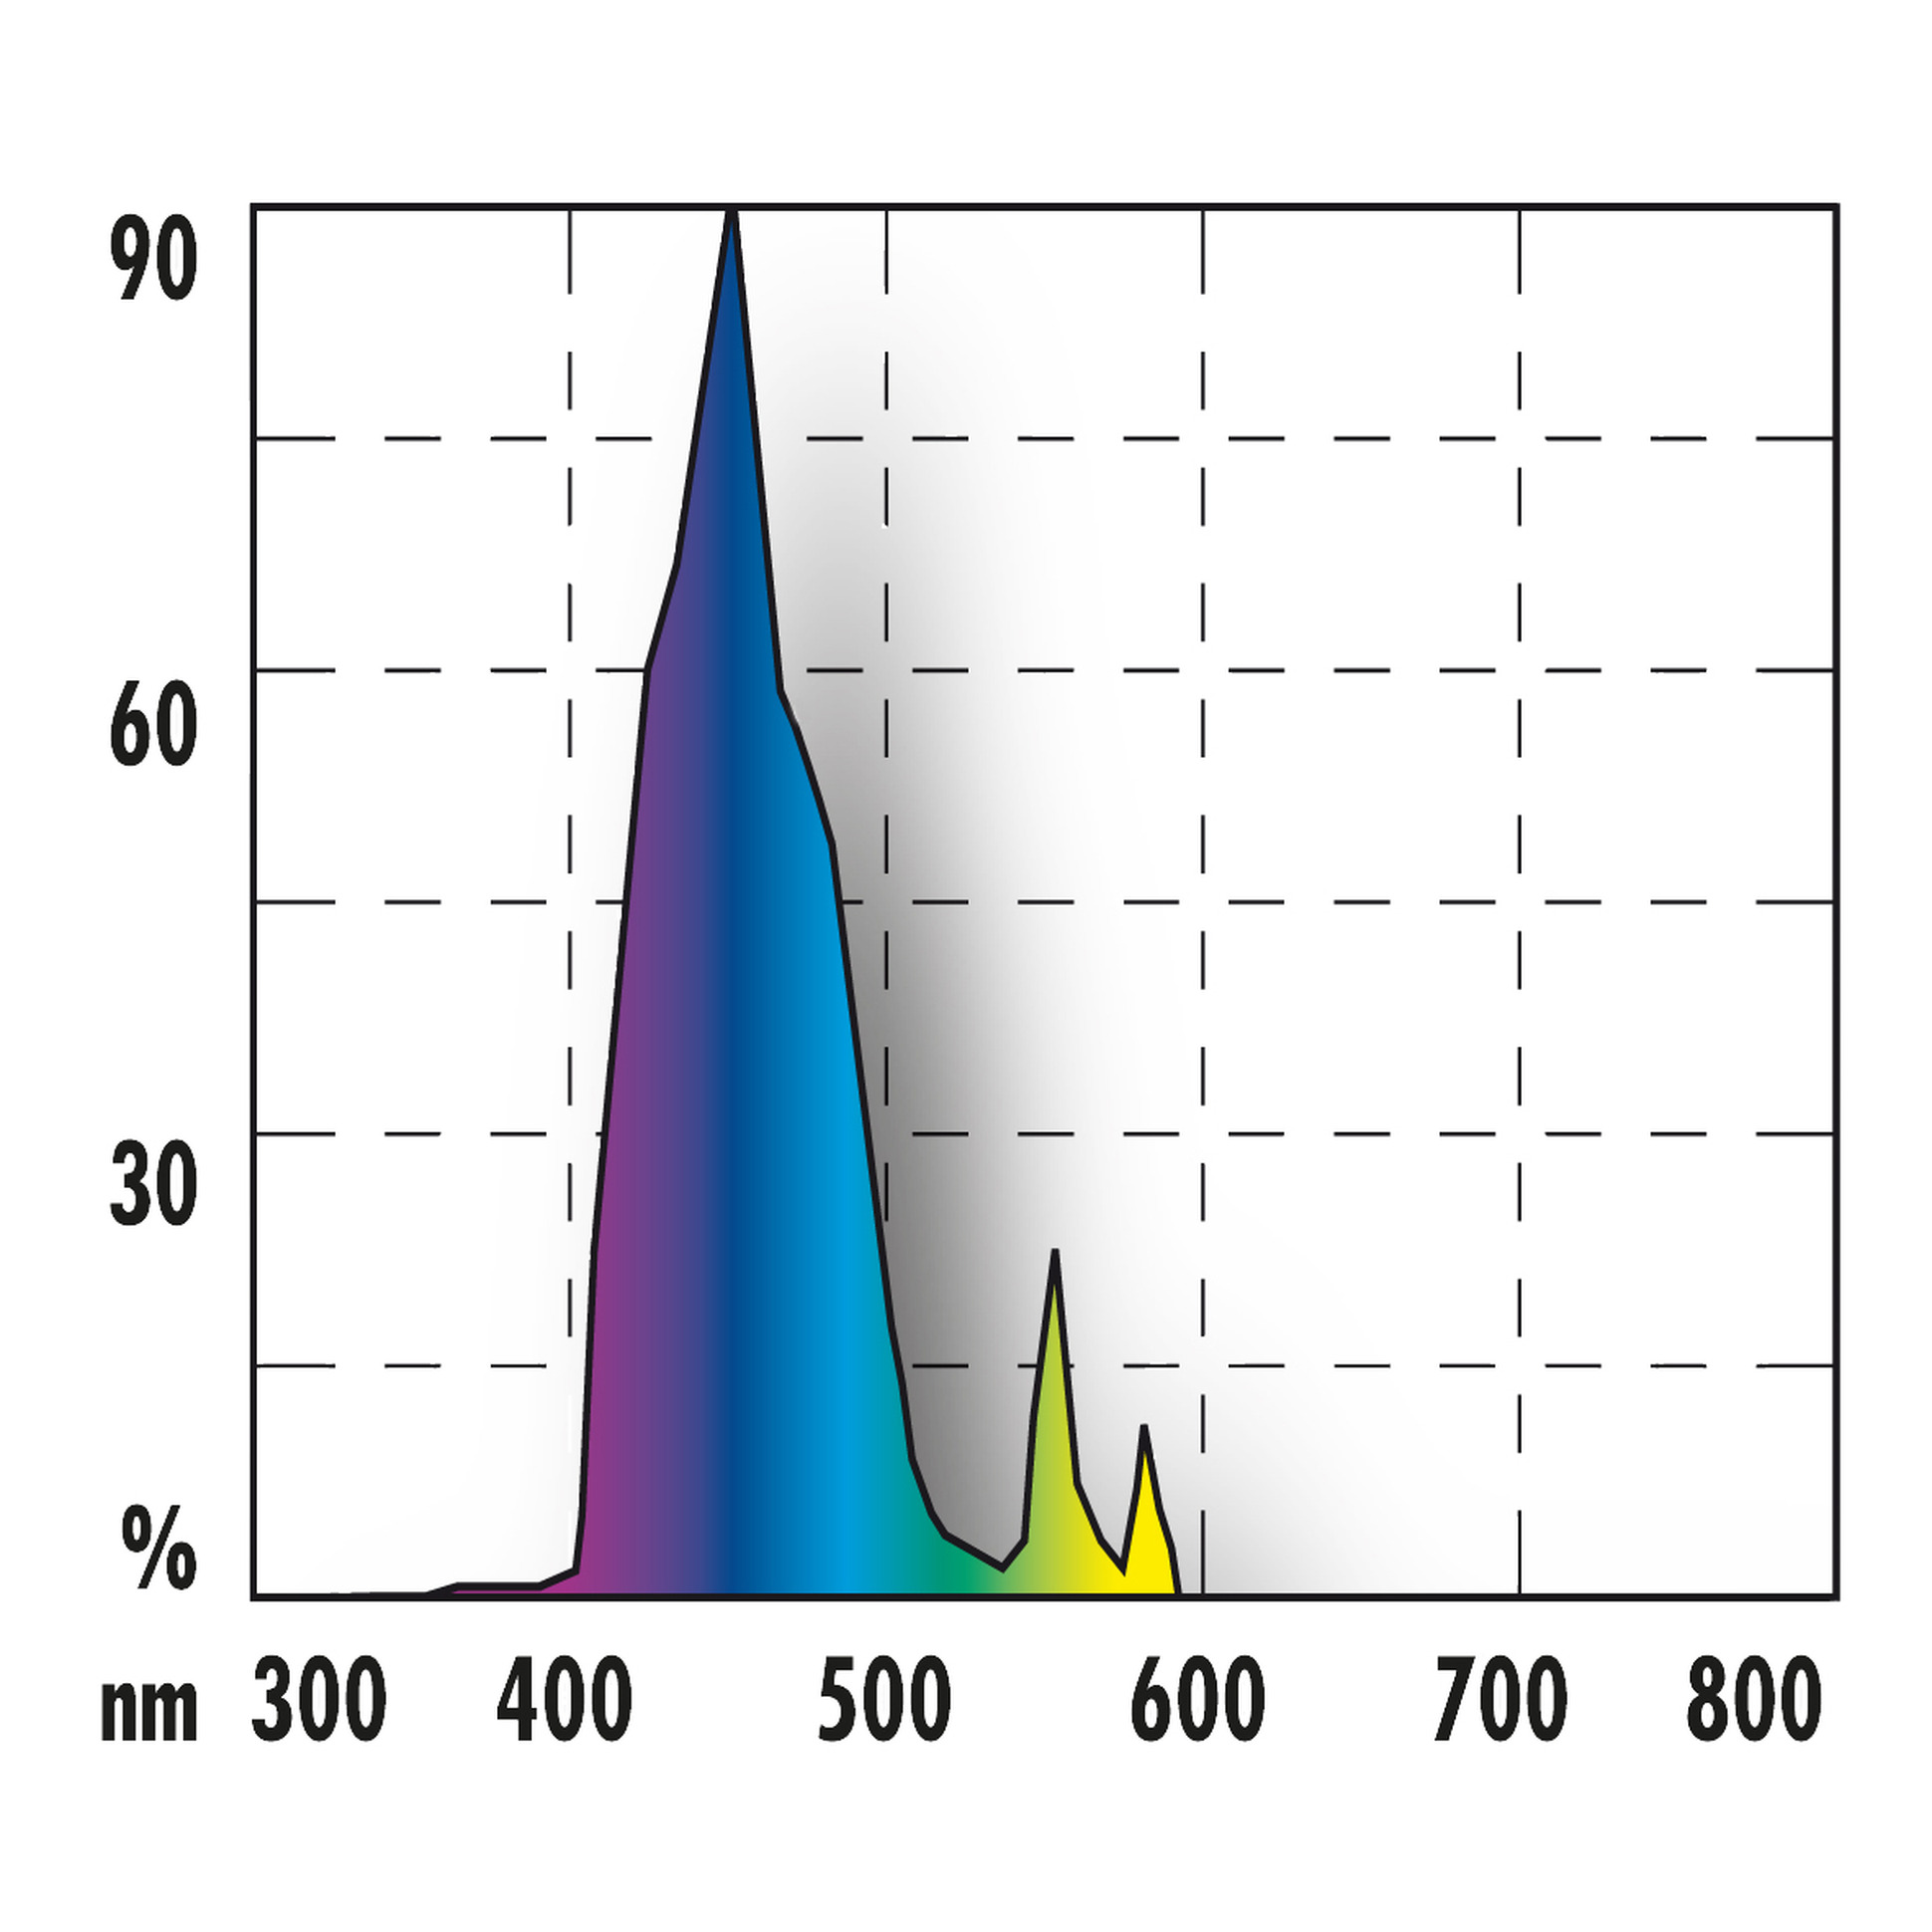 Jbl Solar Ocean Blue Ultra 24 39 W Ballast T5 Ho 39w 2 Wiring Diagram Img Src Images Container W137 H137 62513 Alt